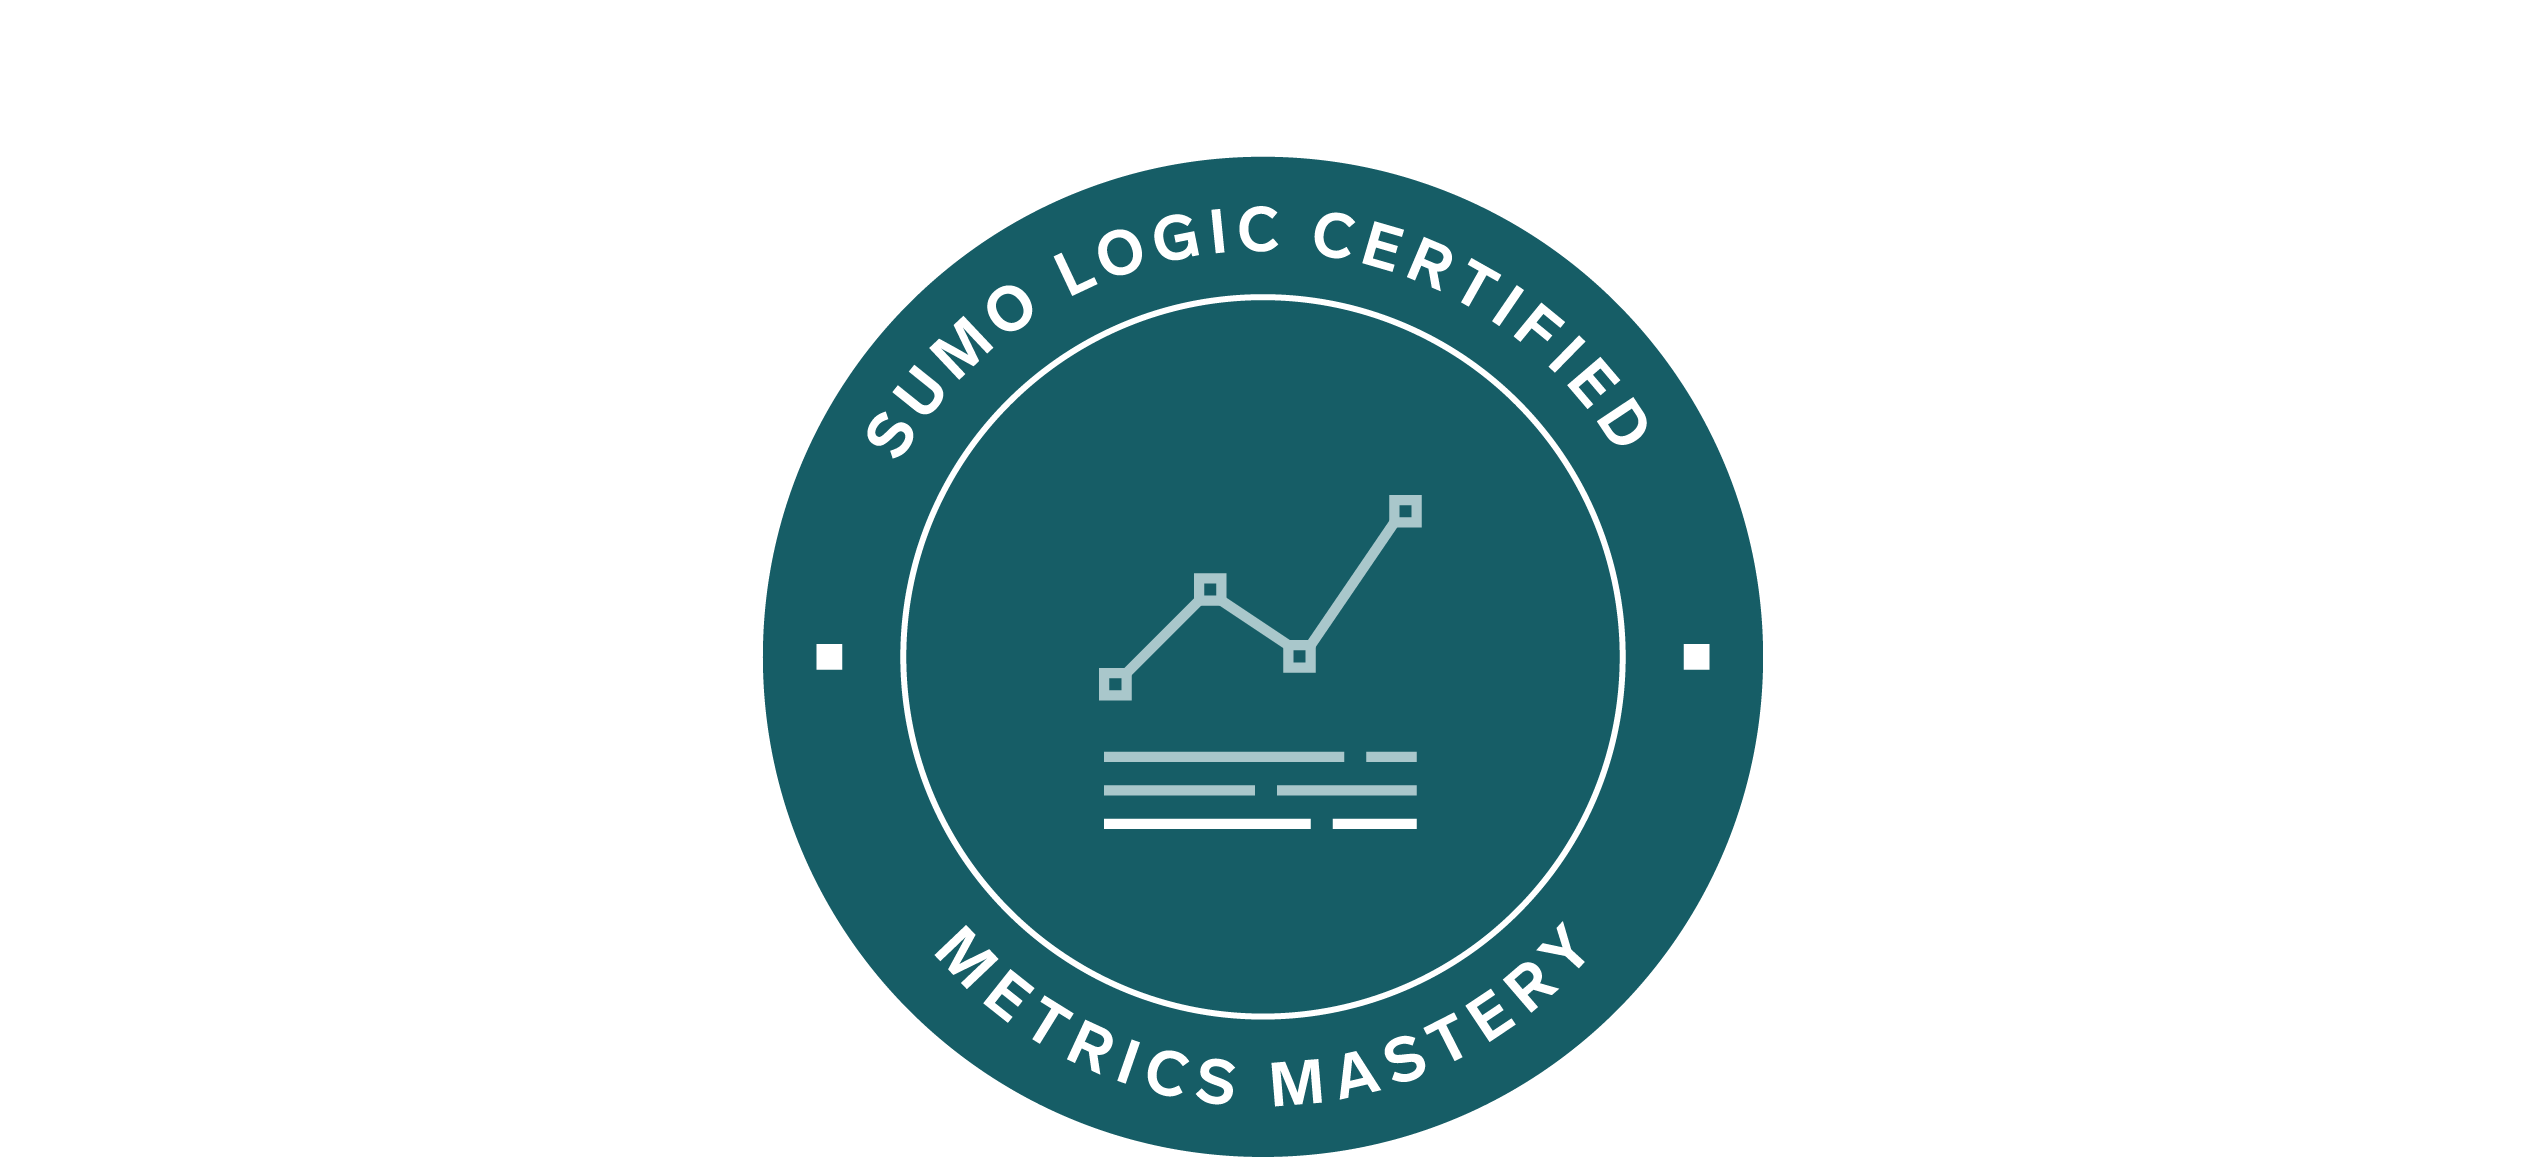 Metrics Mastery